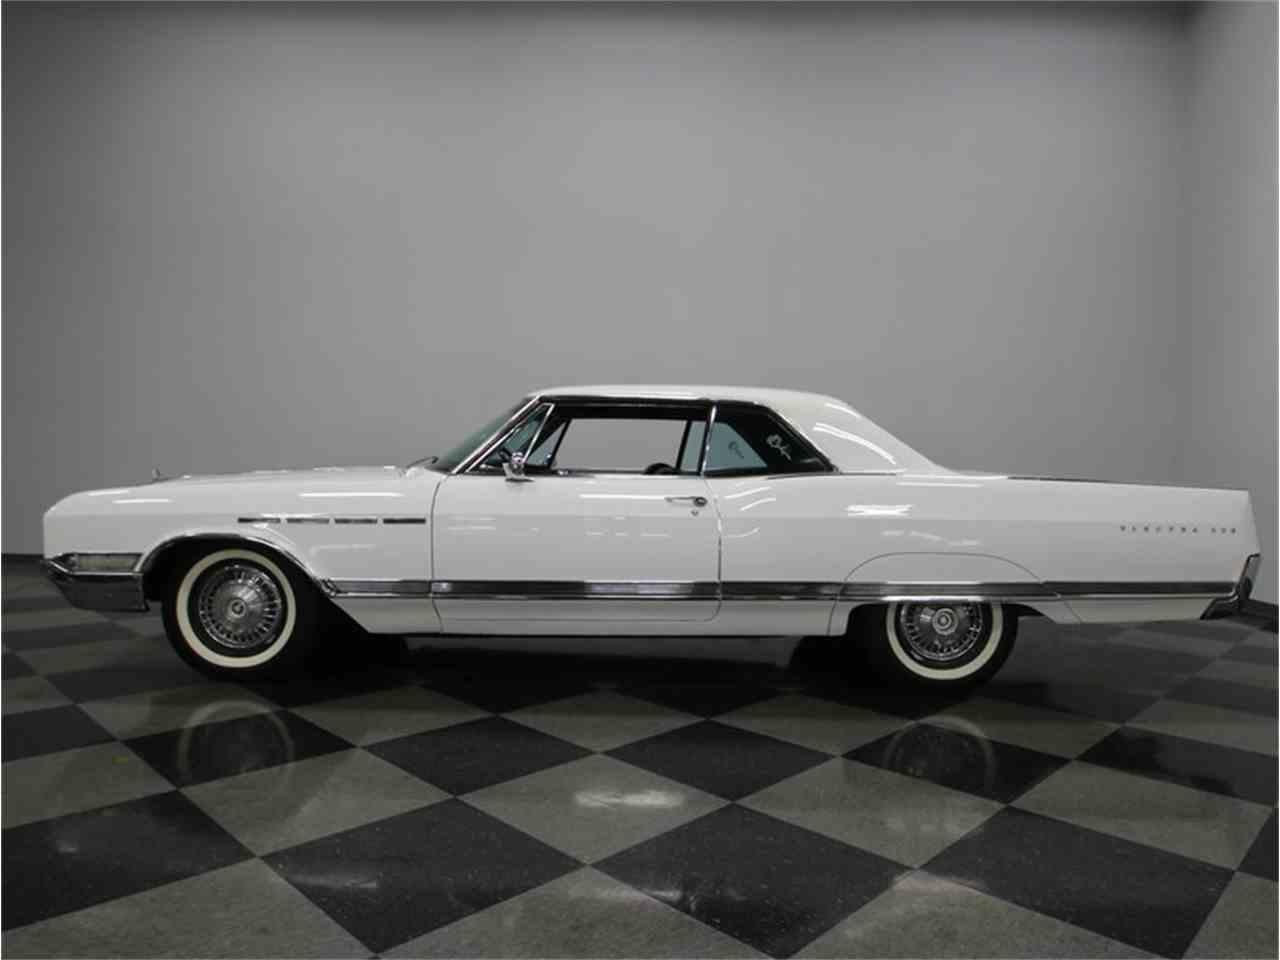 1965 Buick Electra 225 For Sale Classiccars Com Cc 976581